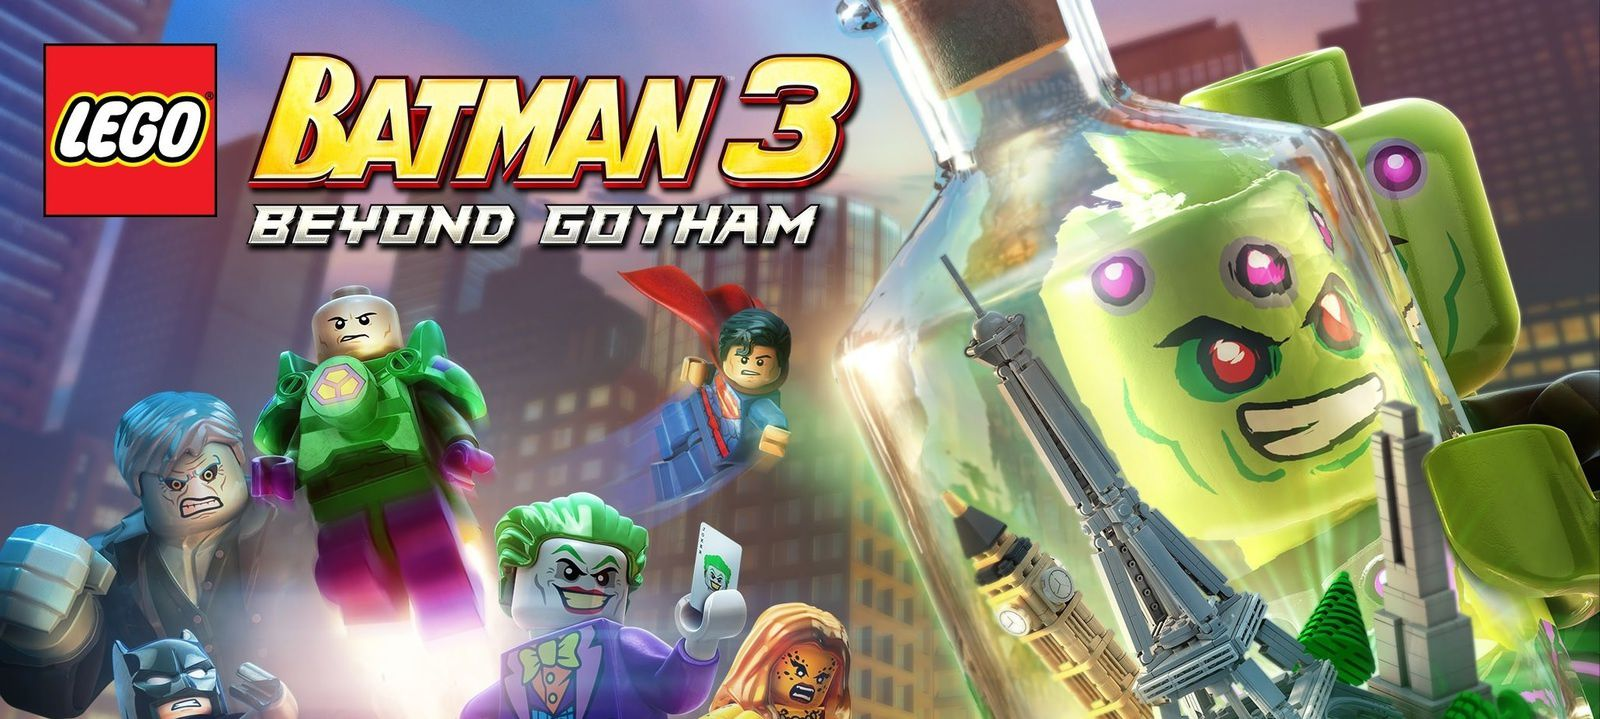 [MON AVIS] Lego Batman 3: Au-delà de Gotham